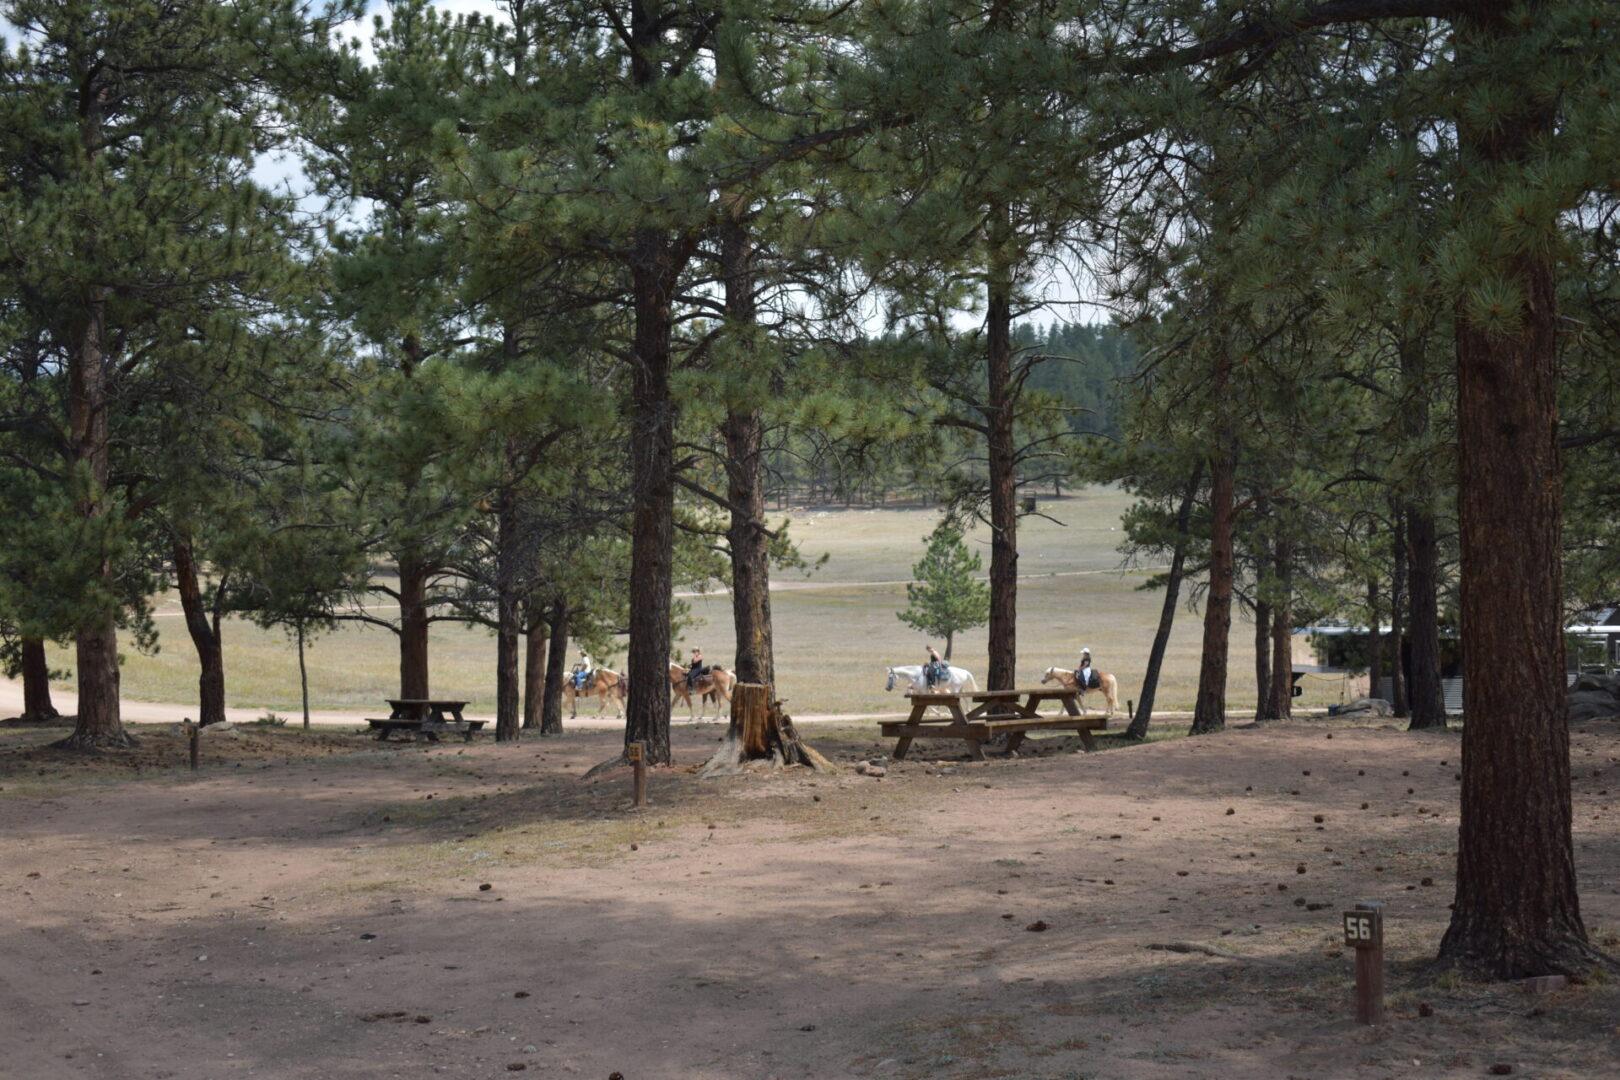 Primitive Site 56-a